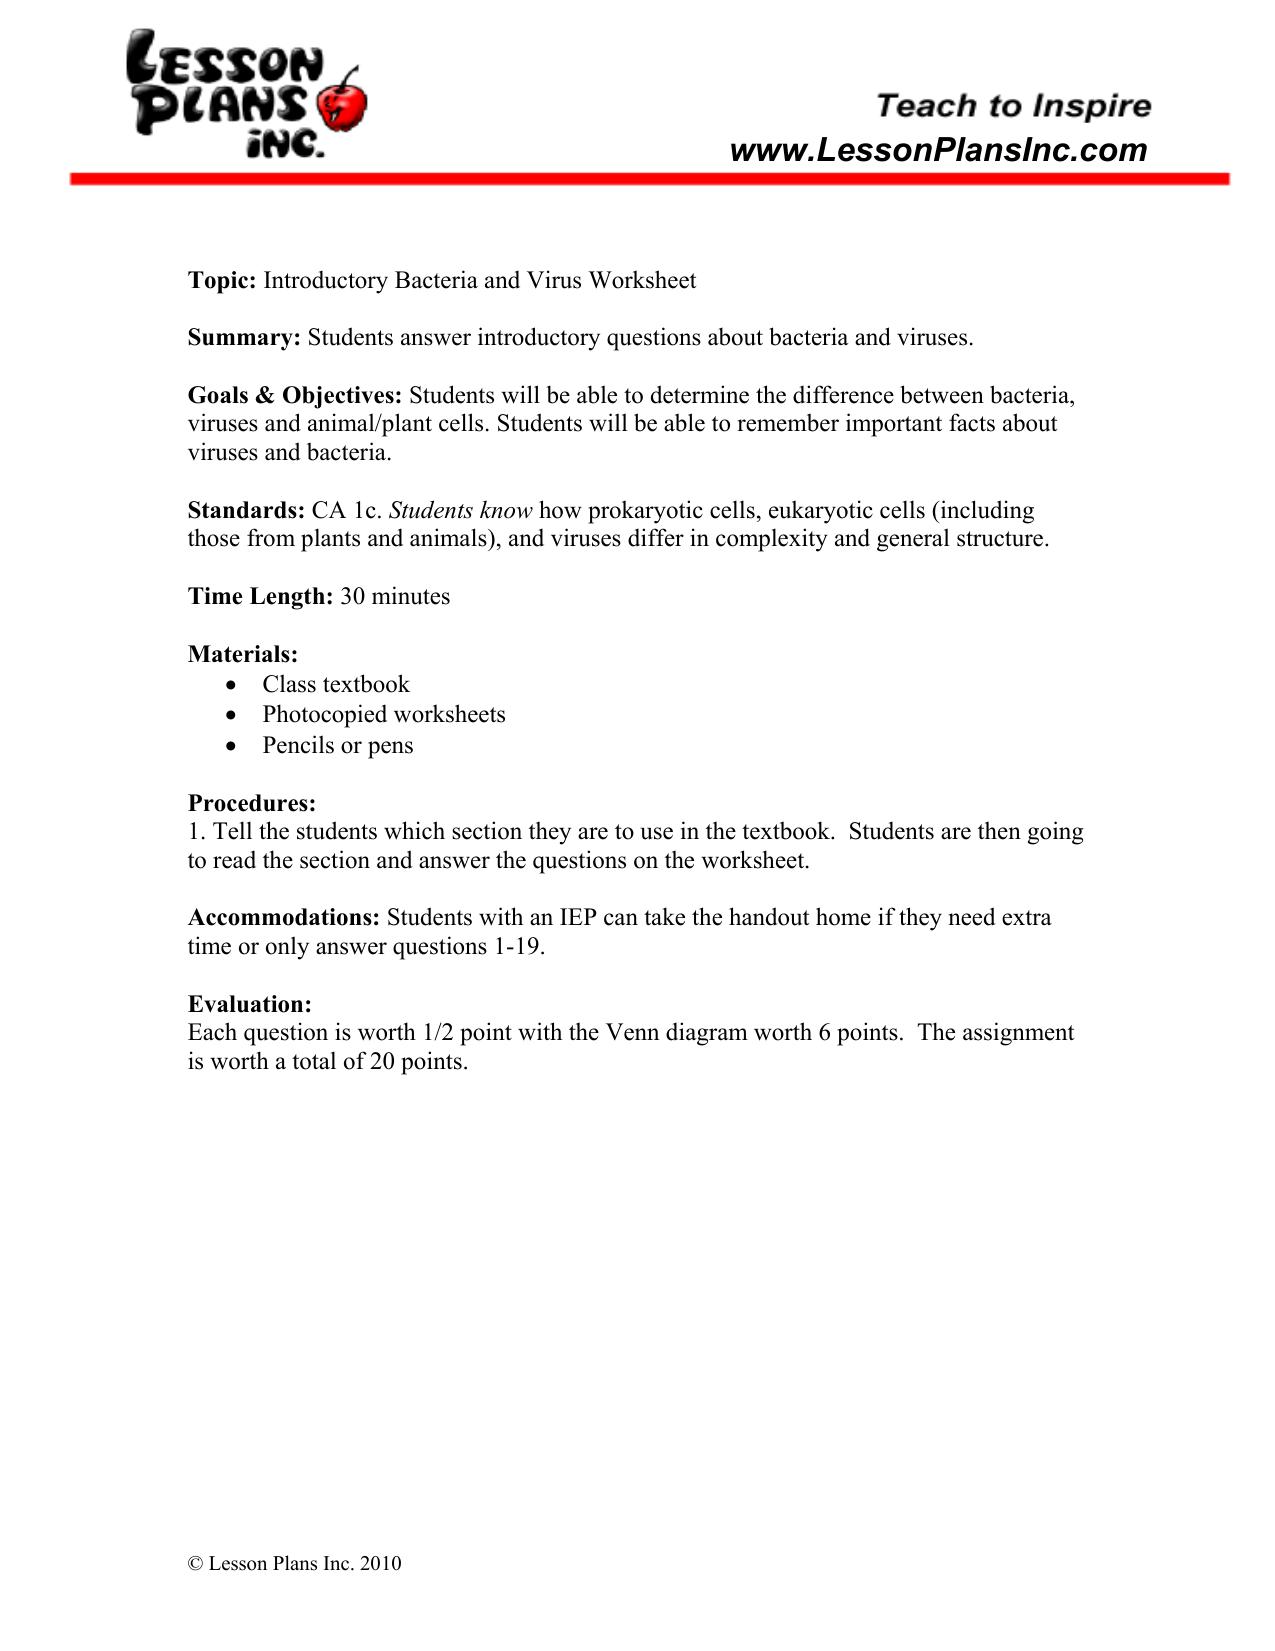 Worksheets Bacteria And Viruses Worksheet comparing viruses and bacteria ws